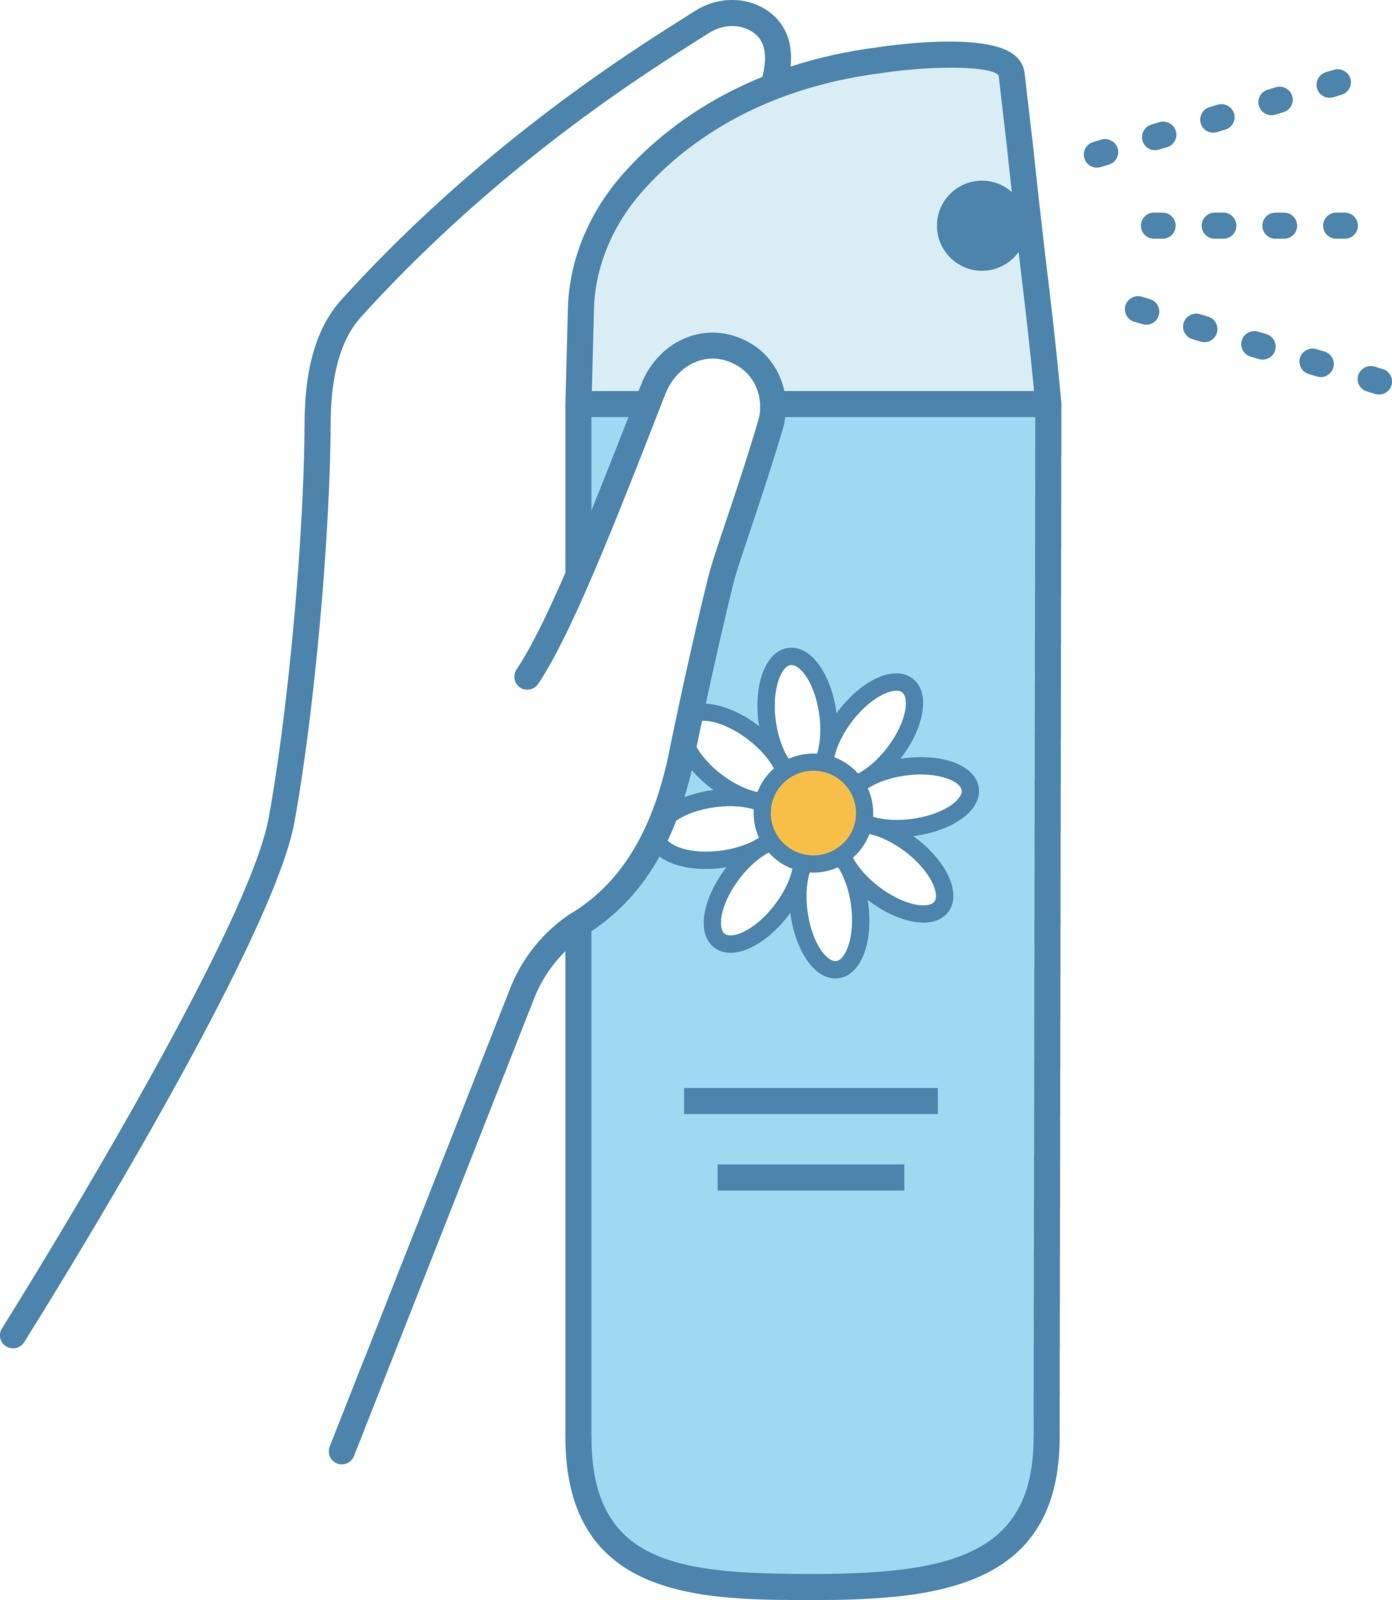 Air freshener color icon. Toilet, bathroom, room air freshener. Isolated vector illustration